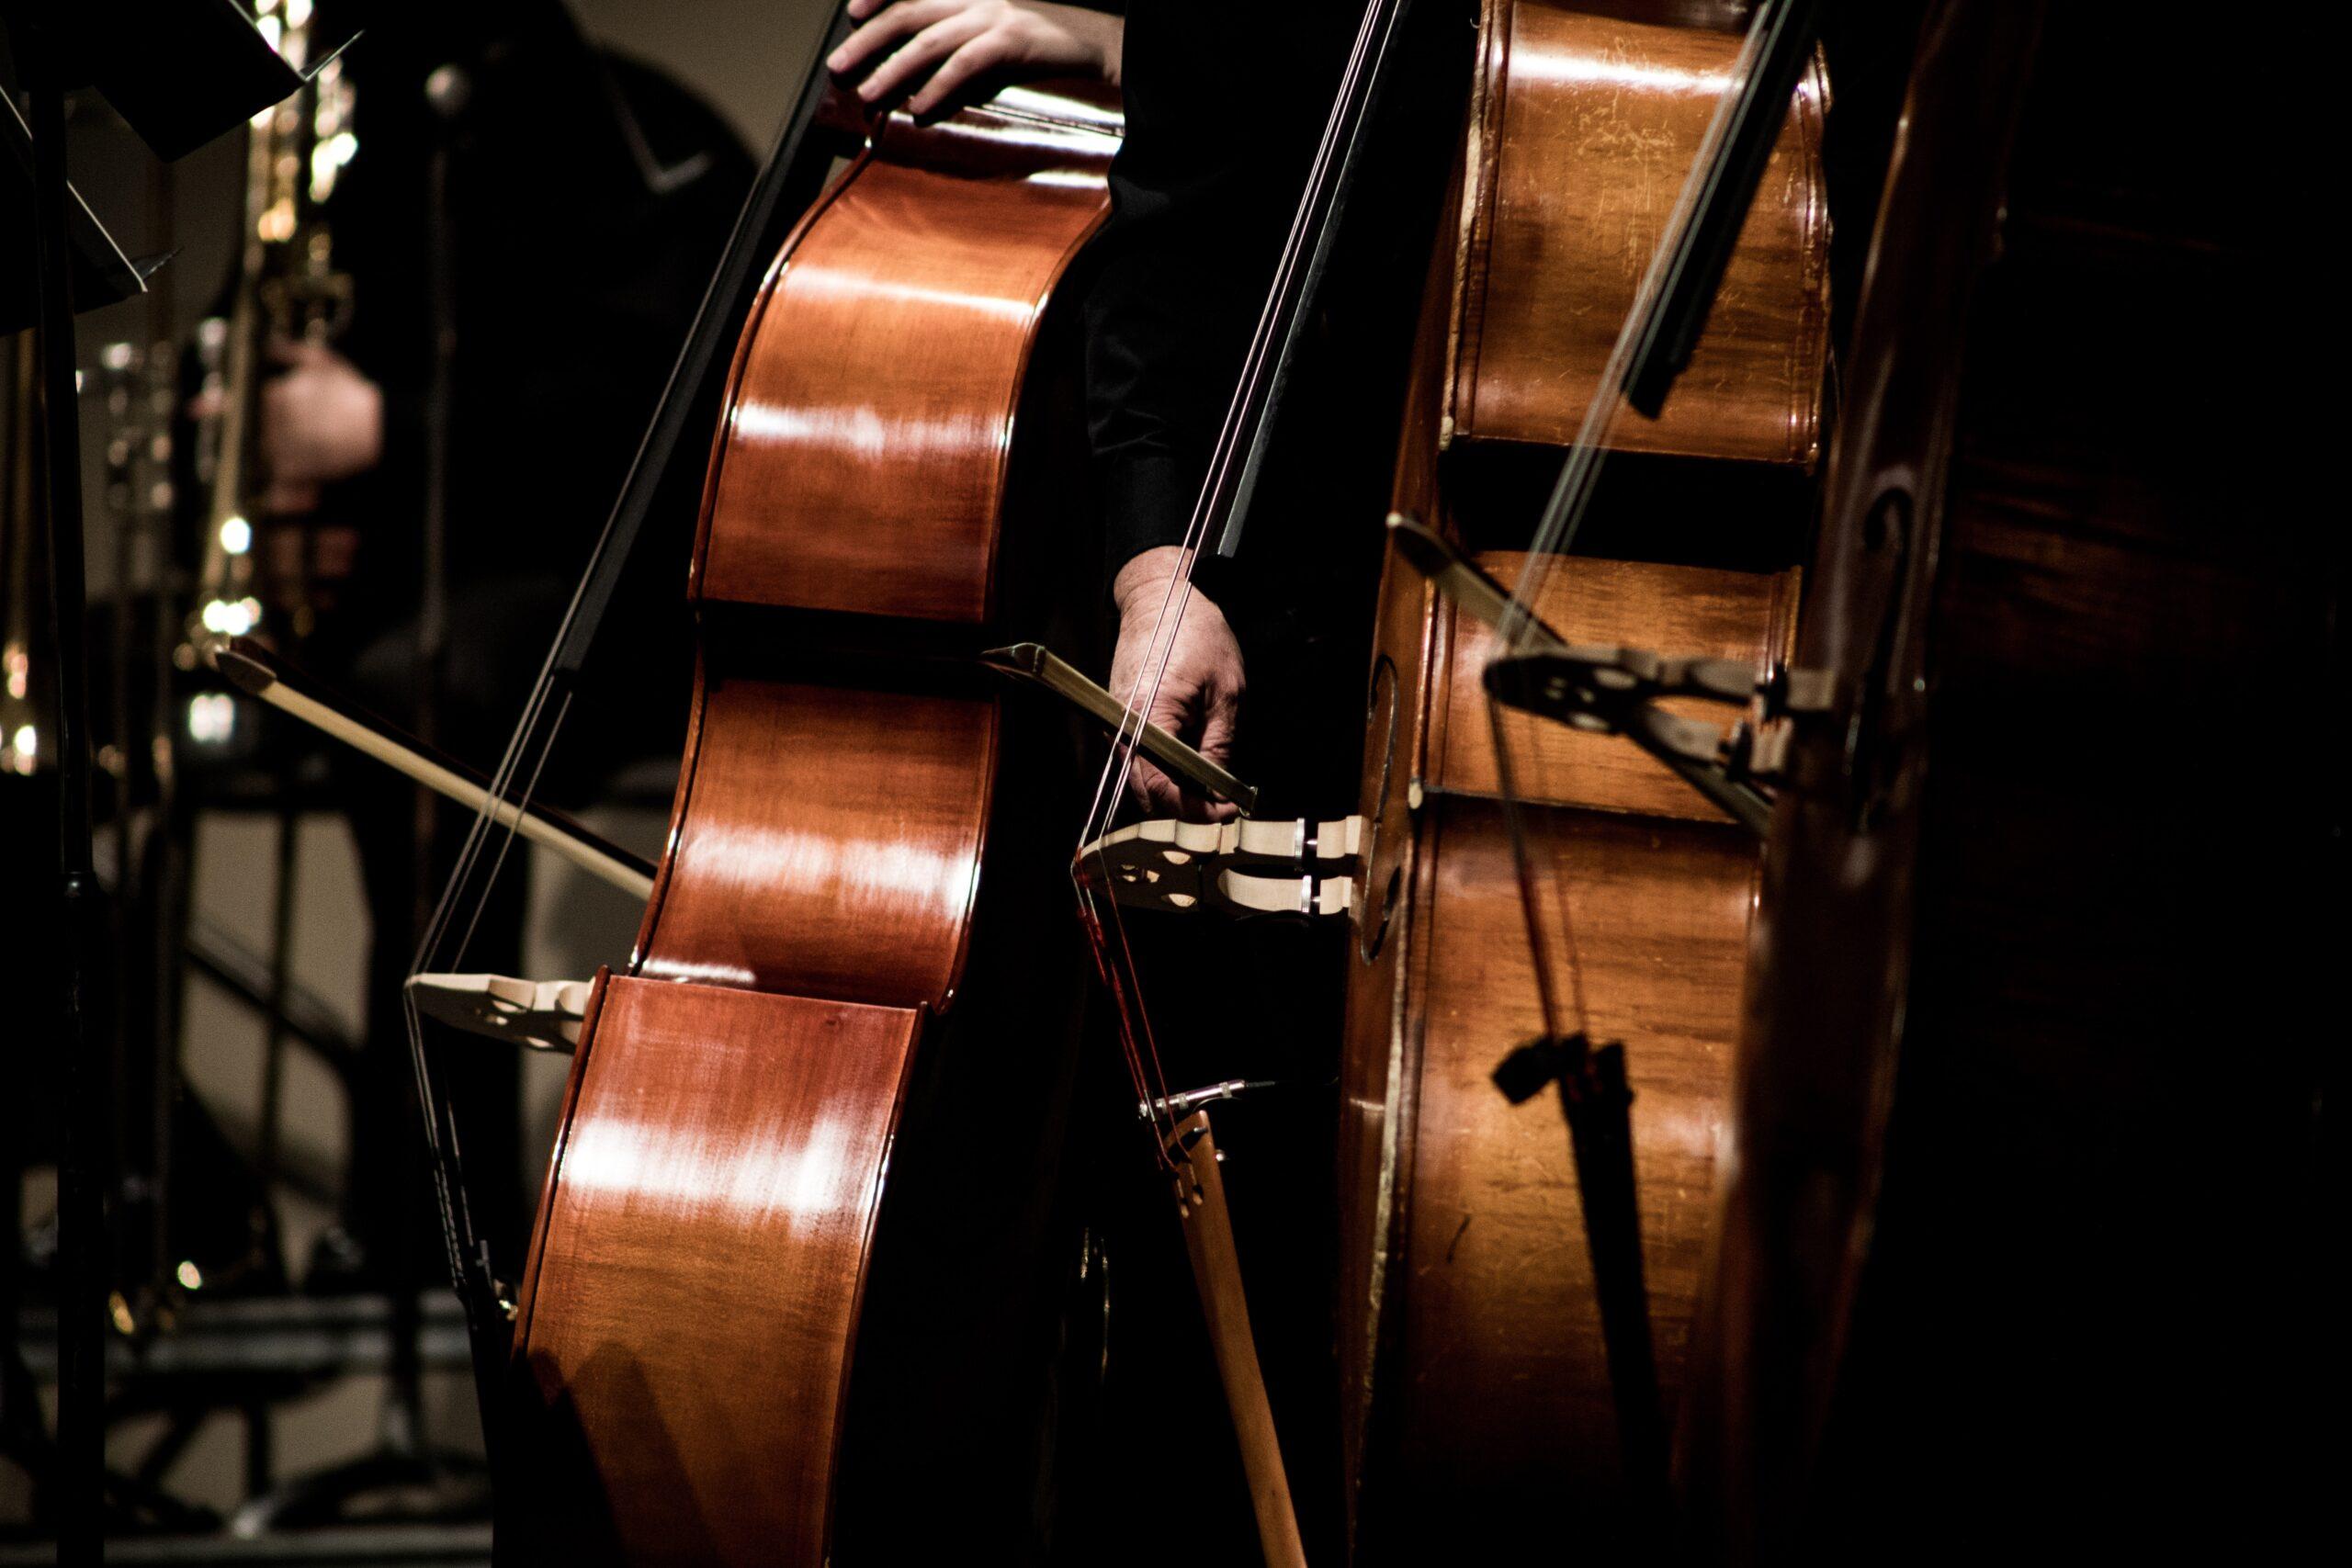 Stringed instruments in an ensemble at the Pine Street Presbyterian Church